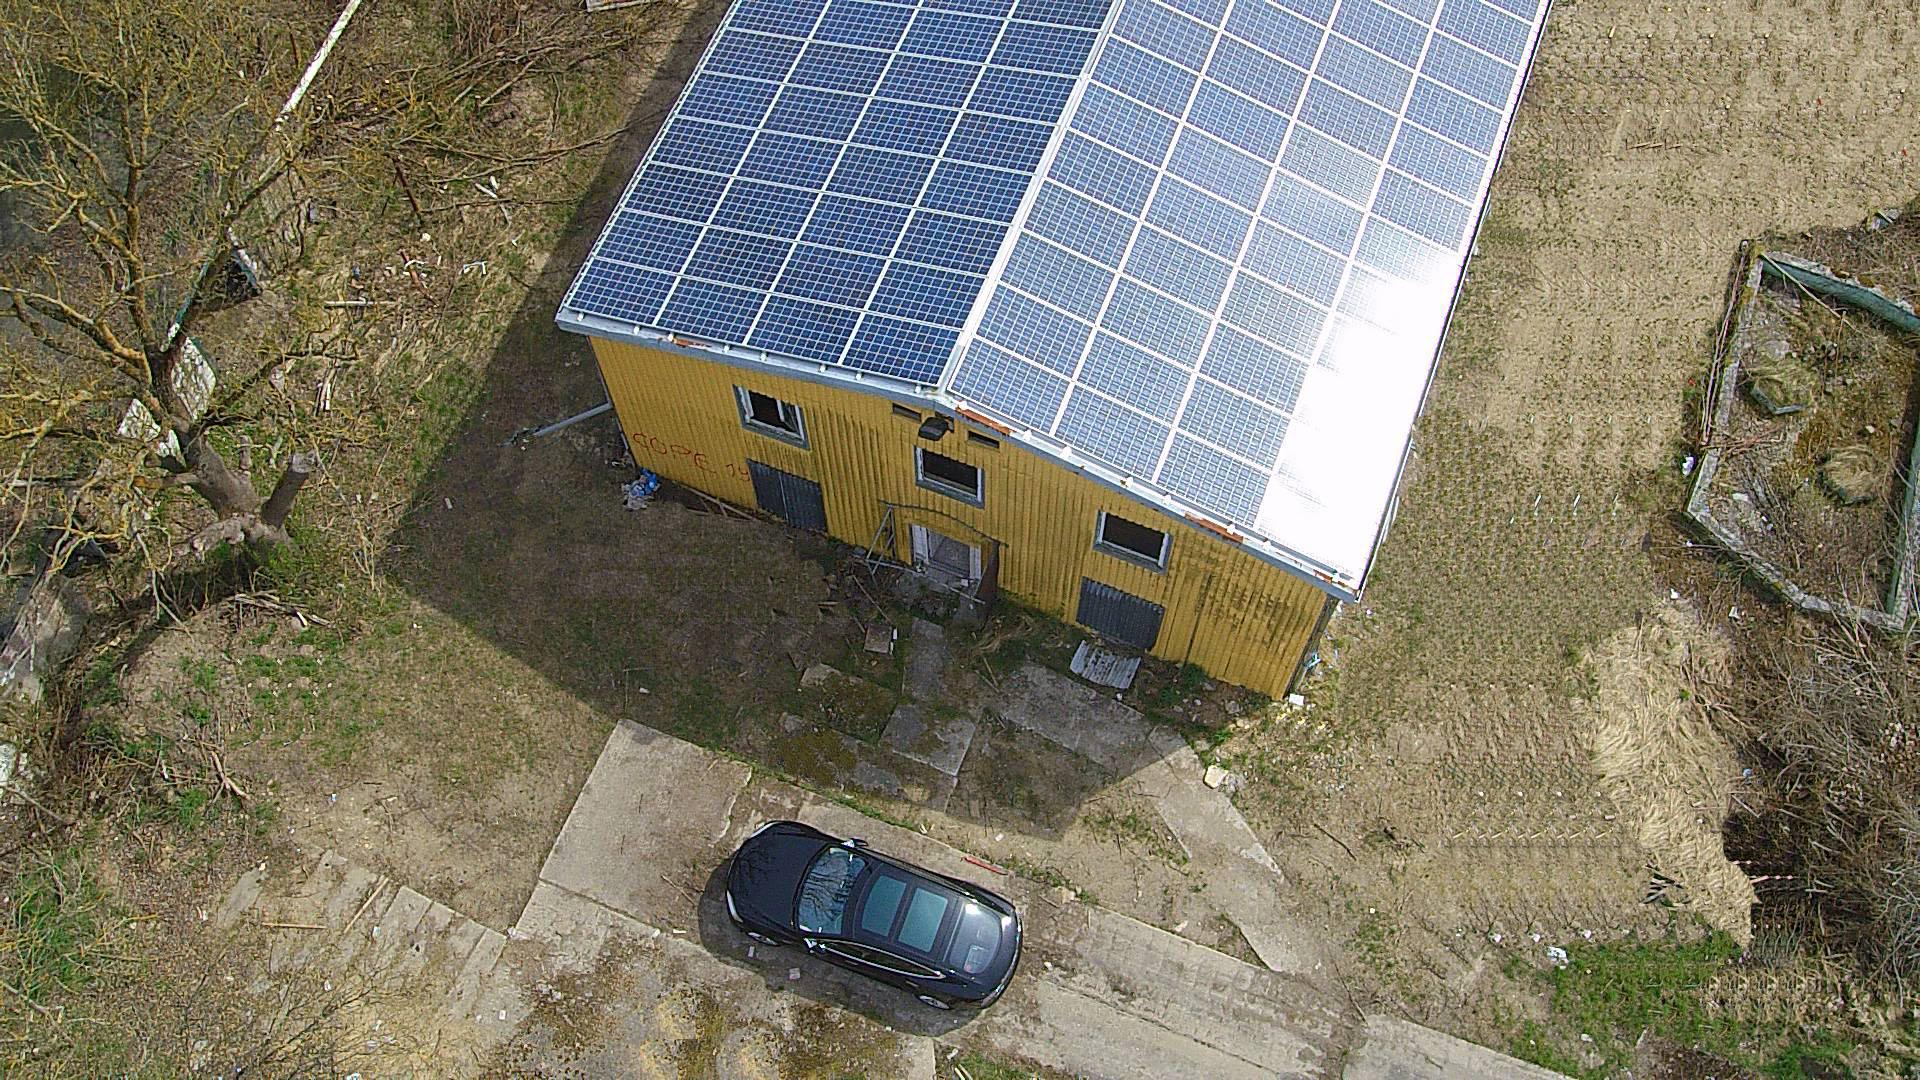 Tesla SolarRoof